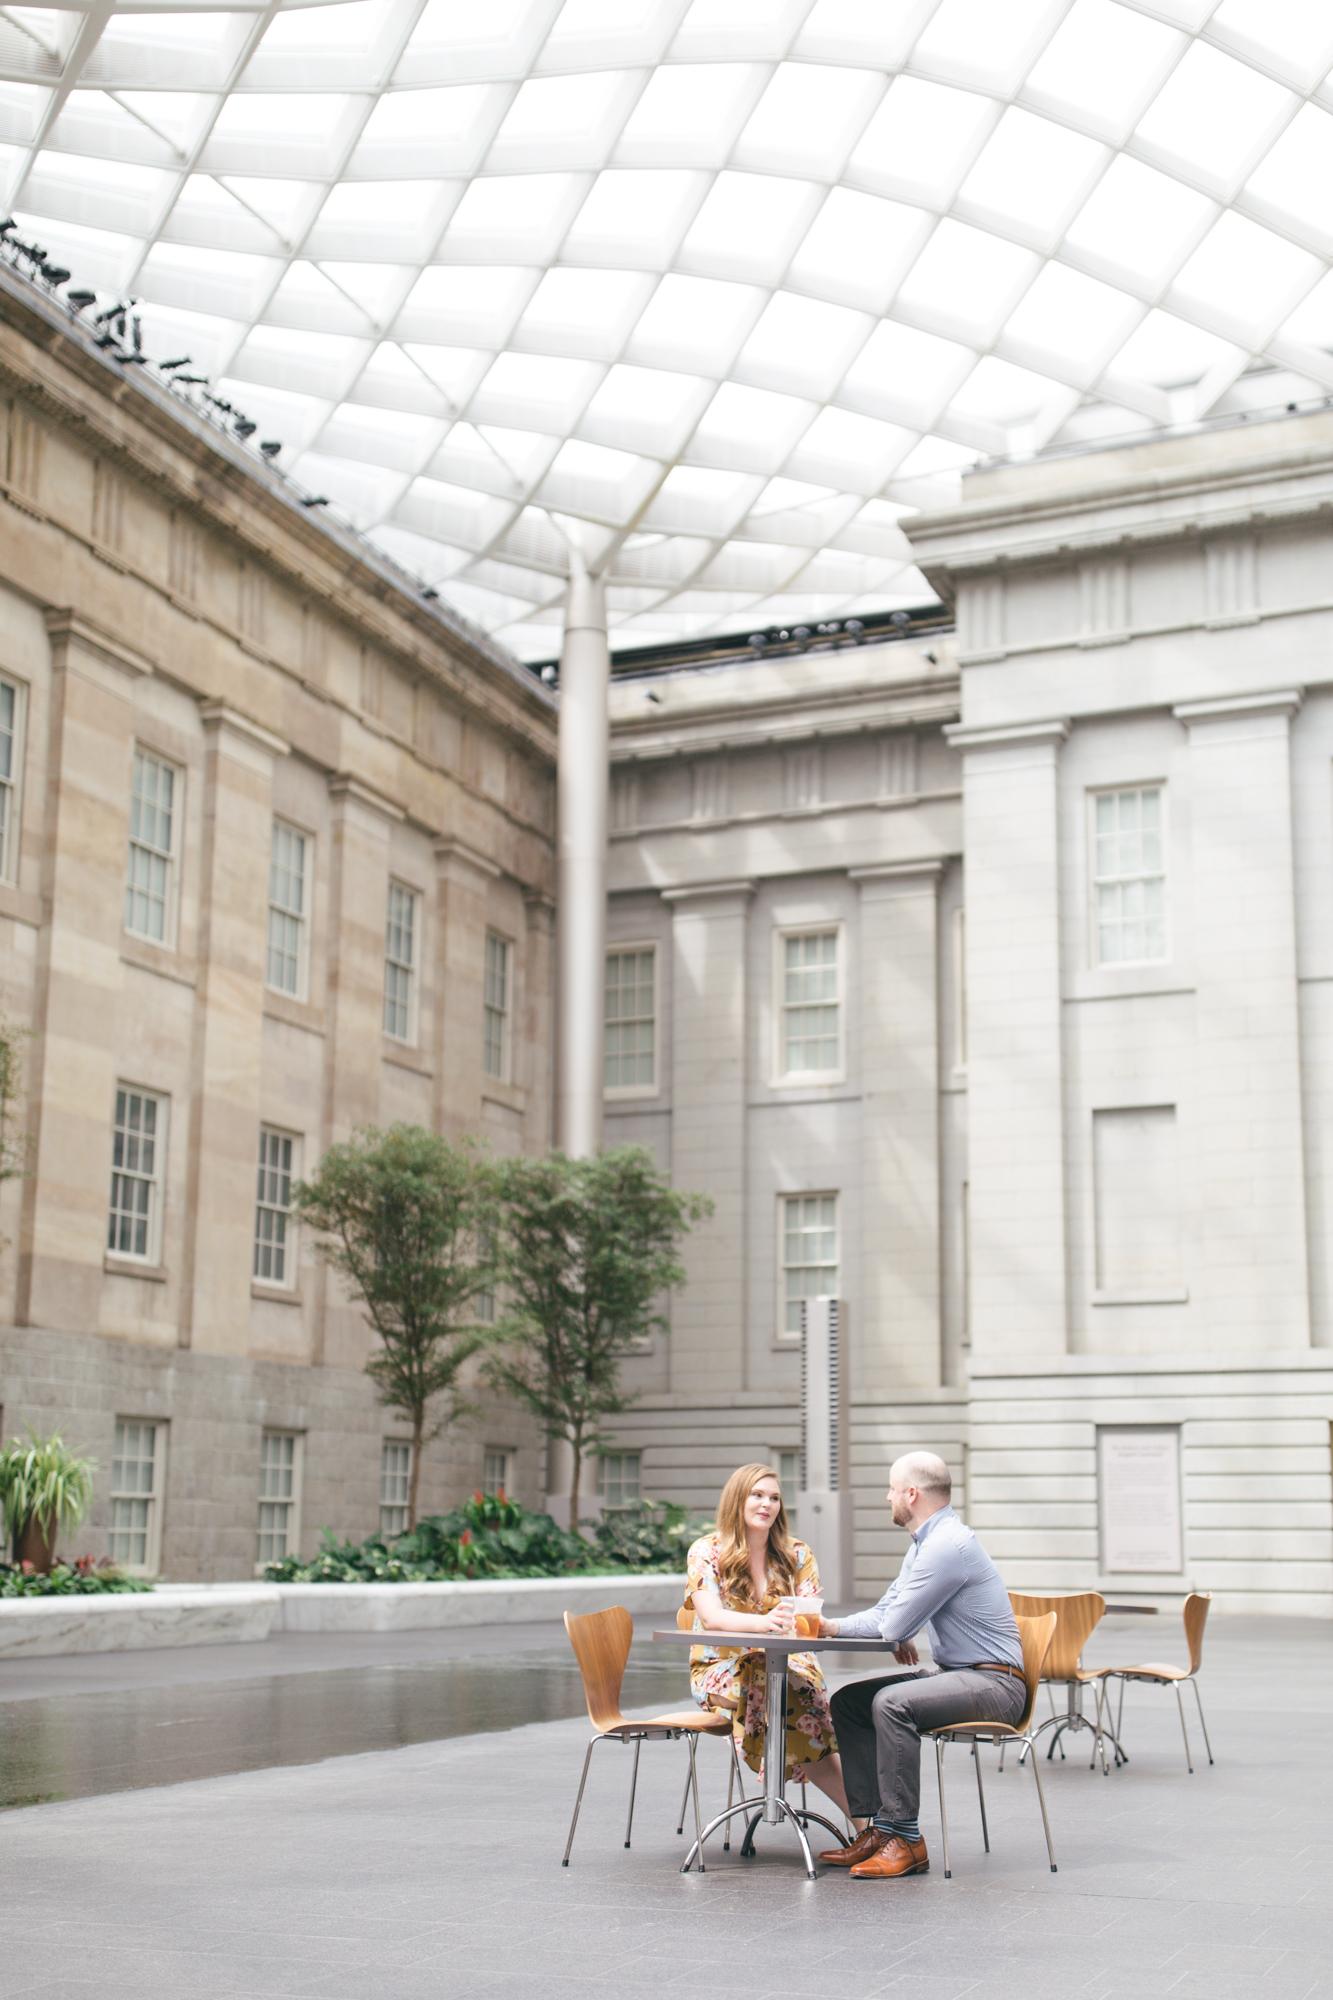 Smithsonian National Portrait Gallery Engagement Session | Maral Noori Photography | Washington DC | Atrium